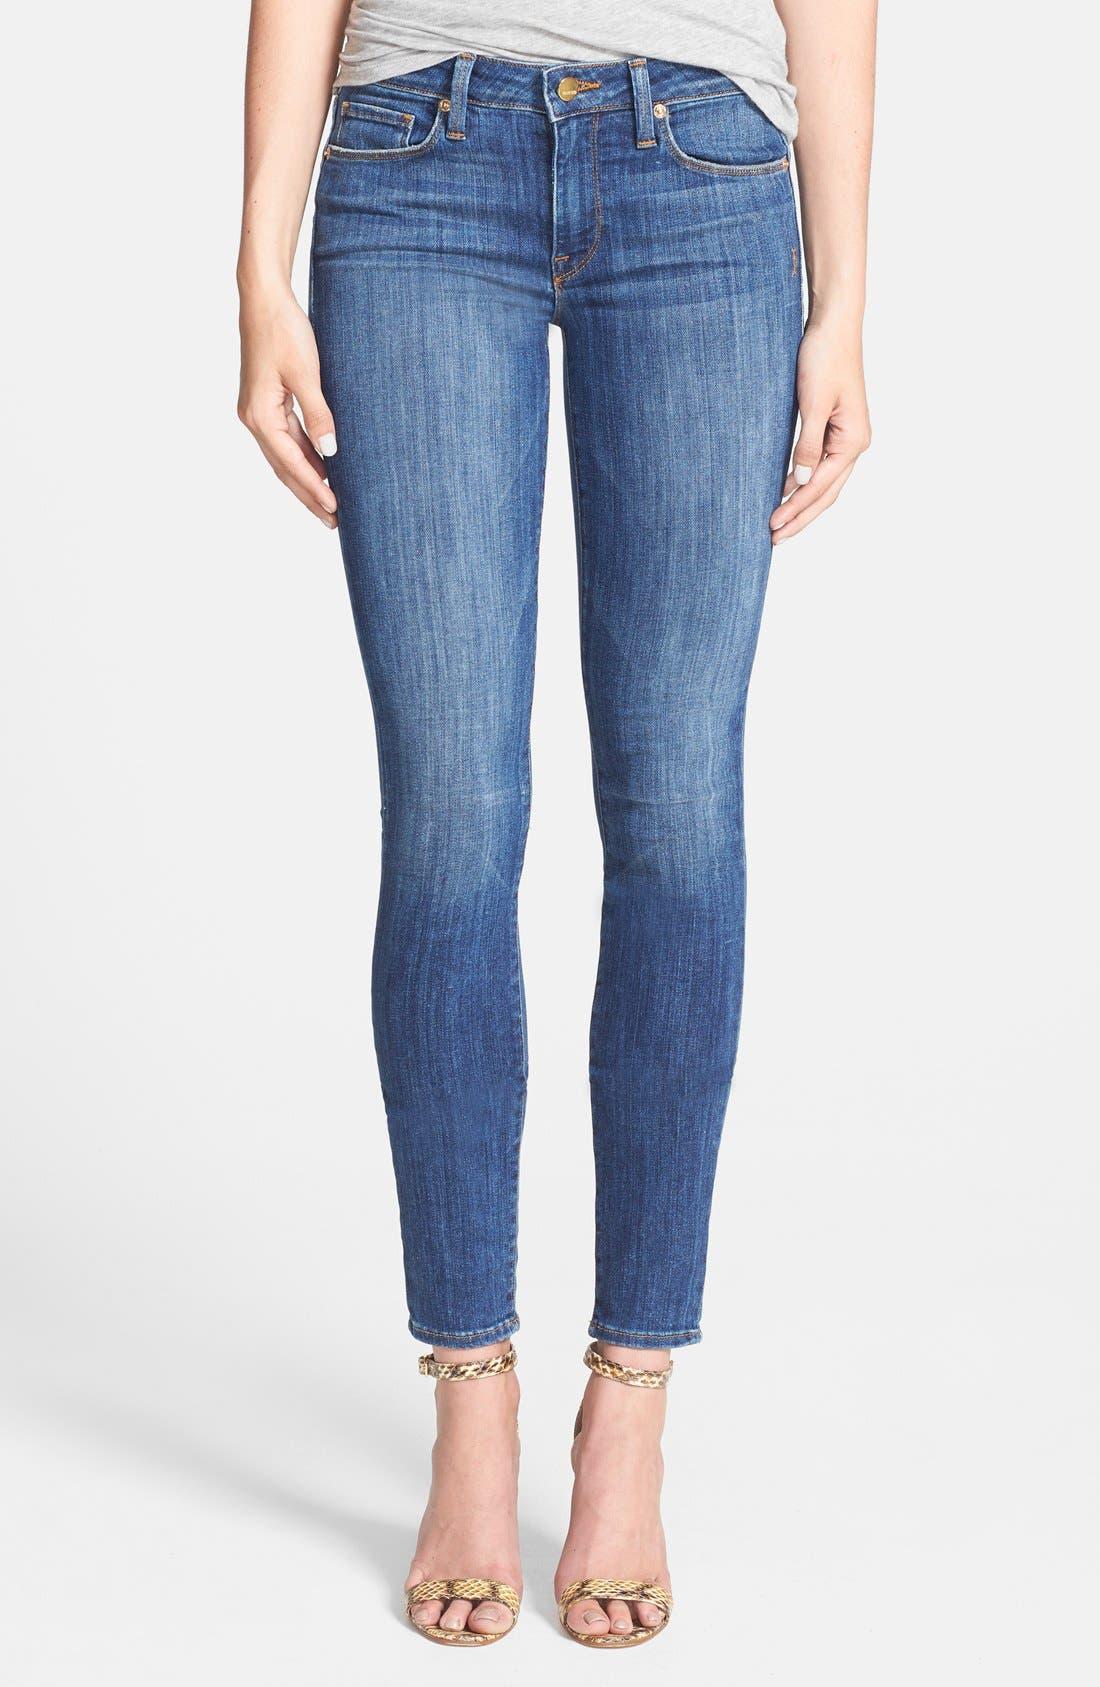 Main Image - Genetic 'Stem' Mid Rise Skinny Jeans (Arena)